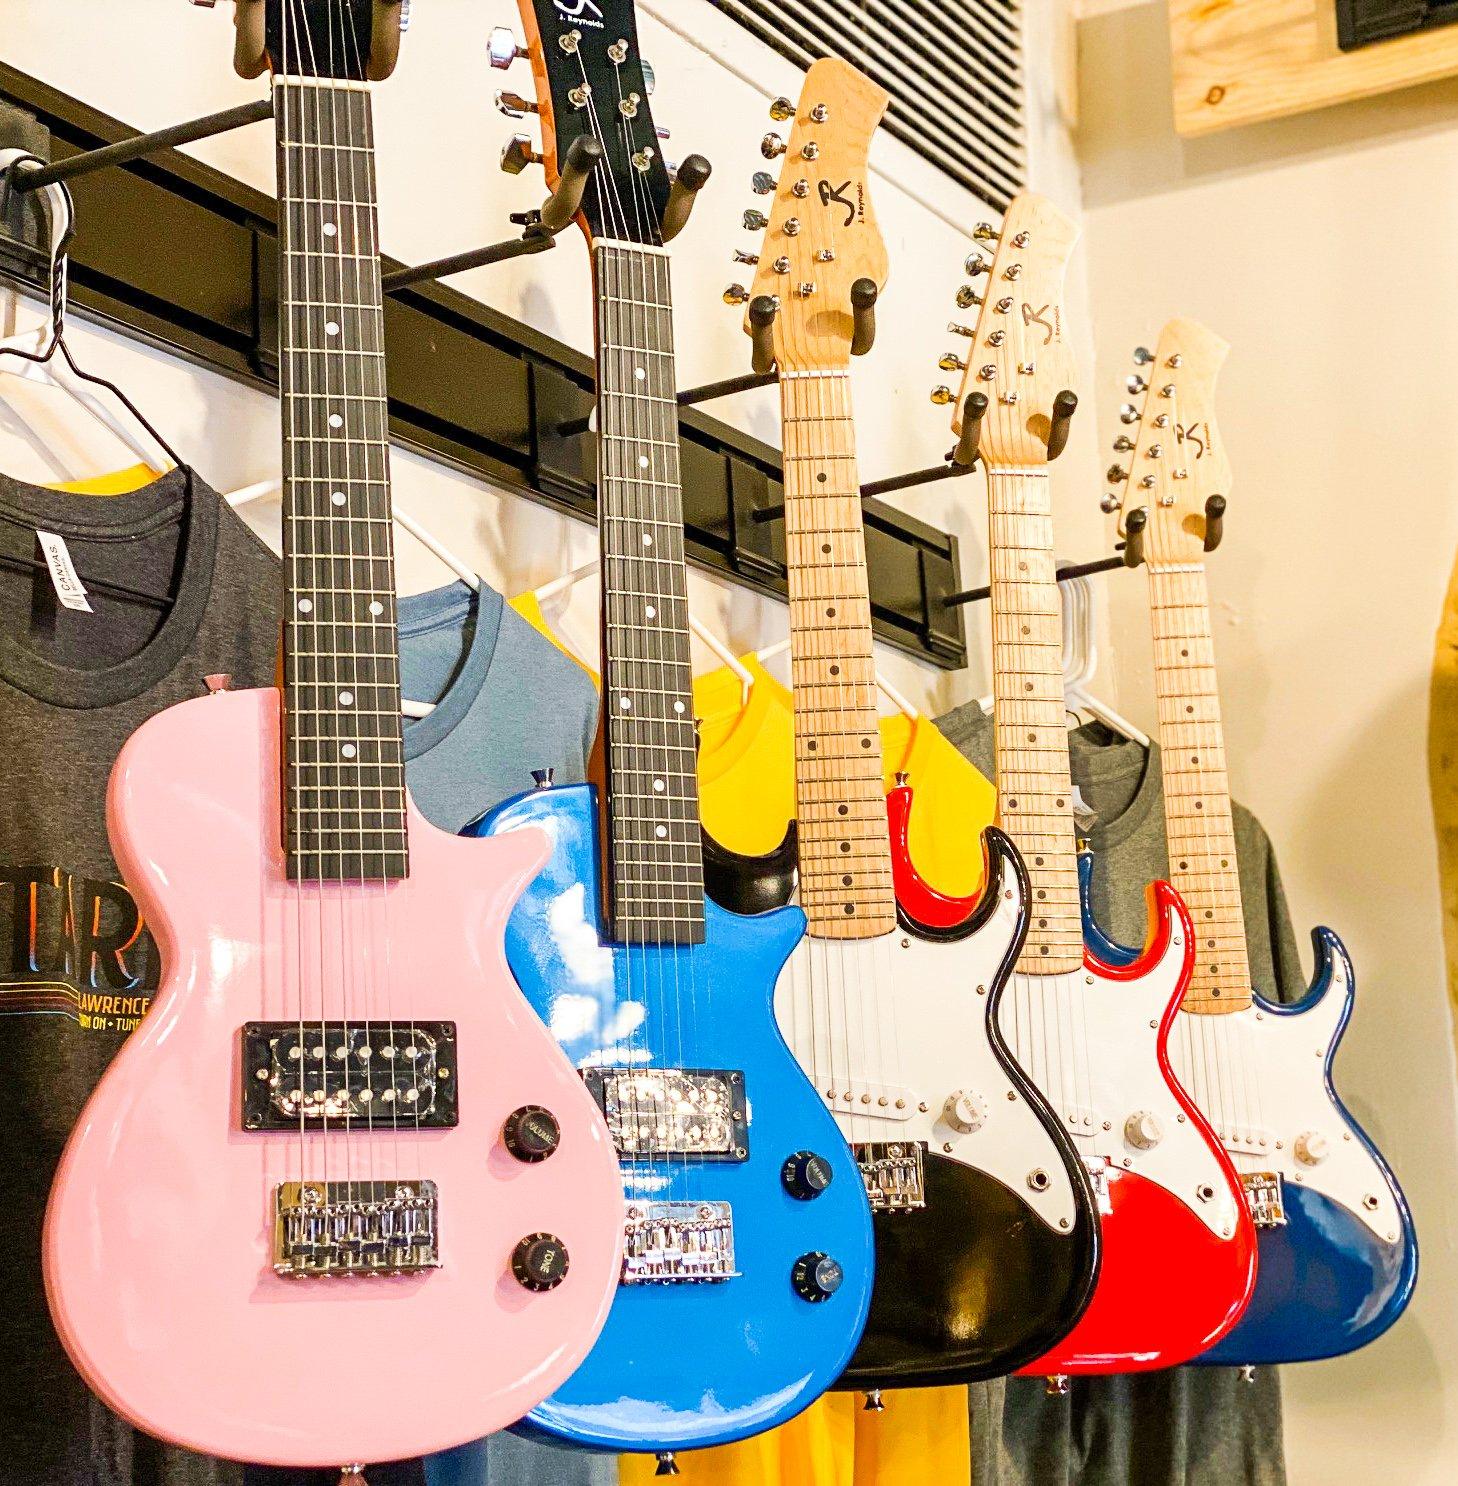 J. Reynolds Mini-Electric Guitar Pak - w/amp, strap, pics - 5 styles